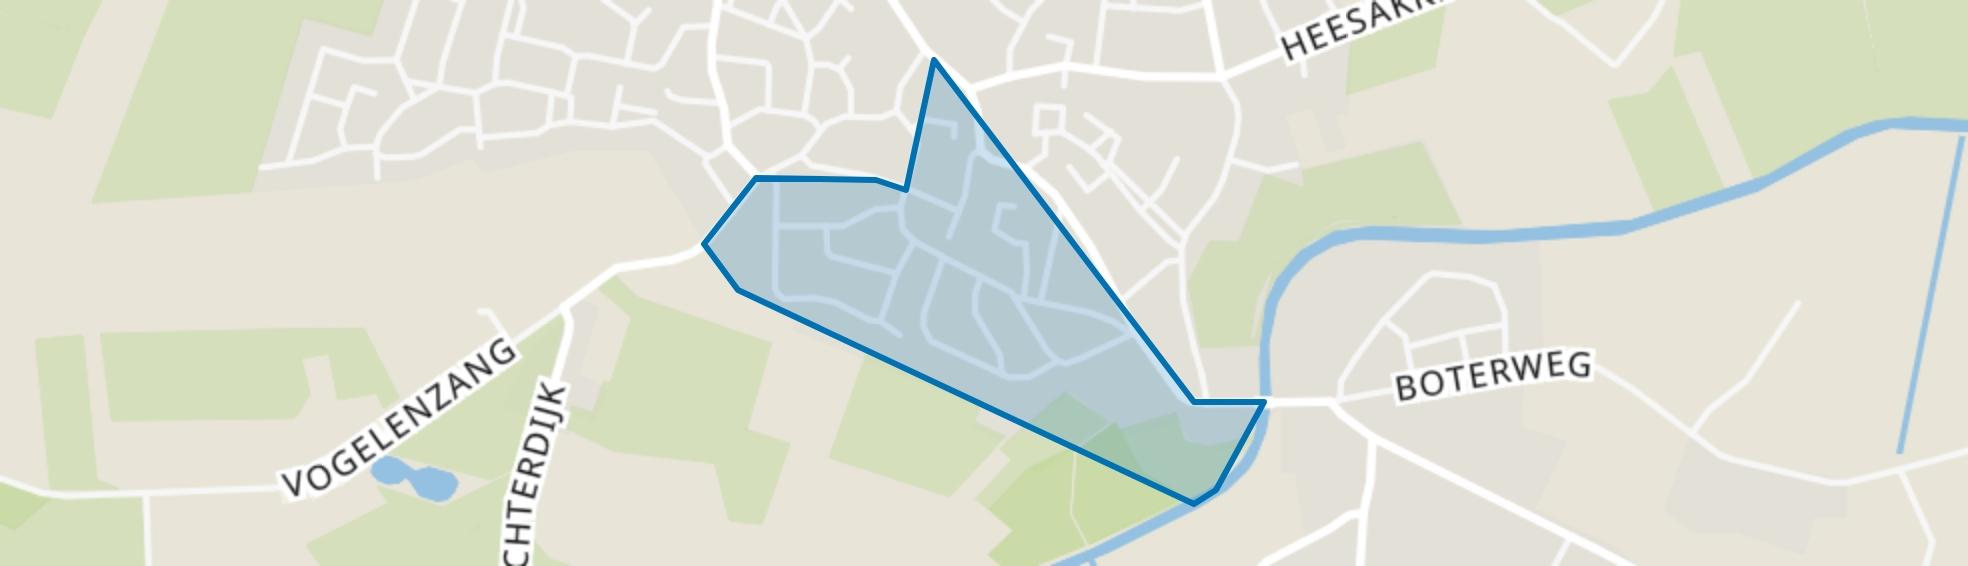 Empeldonk, Erp map